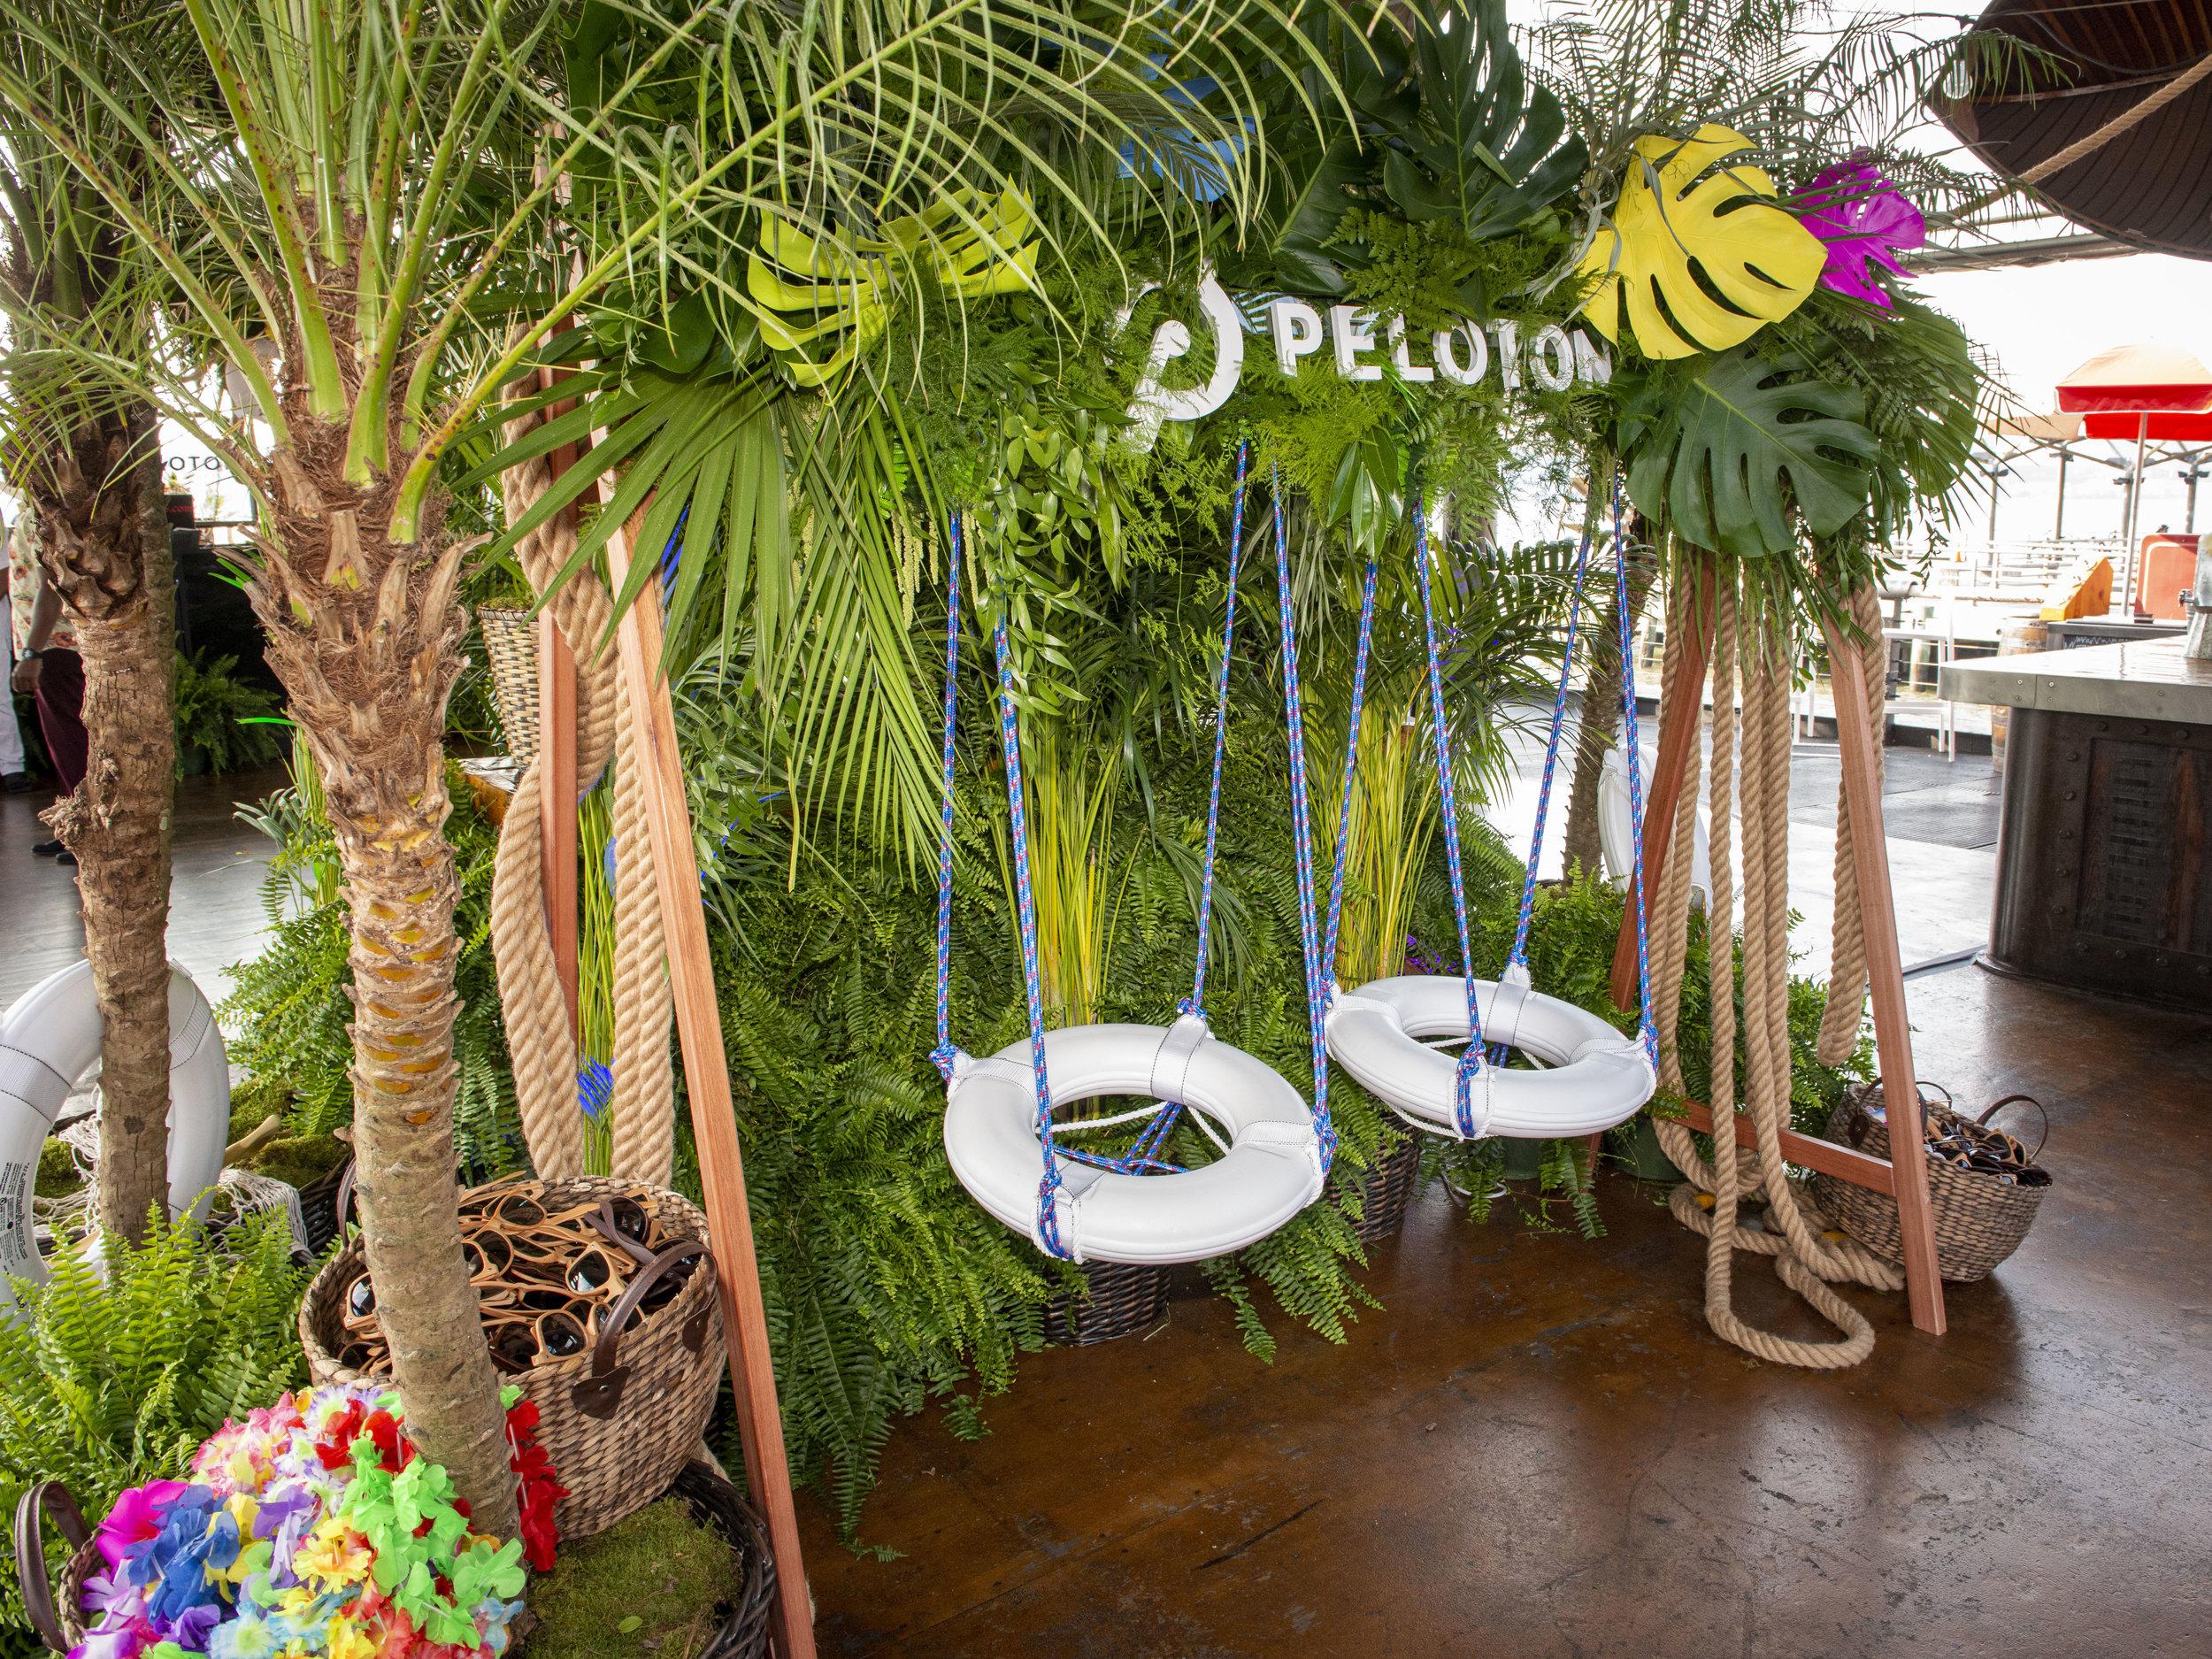 P19-012 Peloton_4.jpg